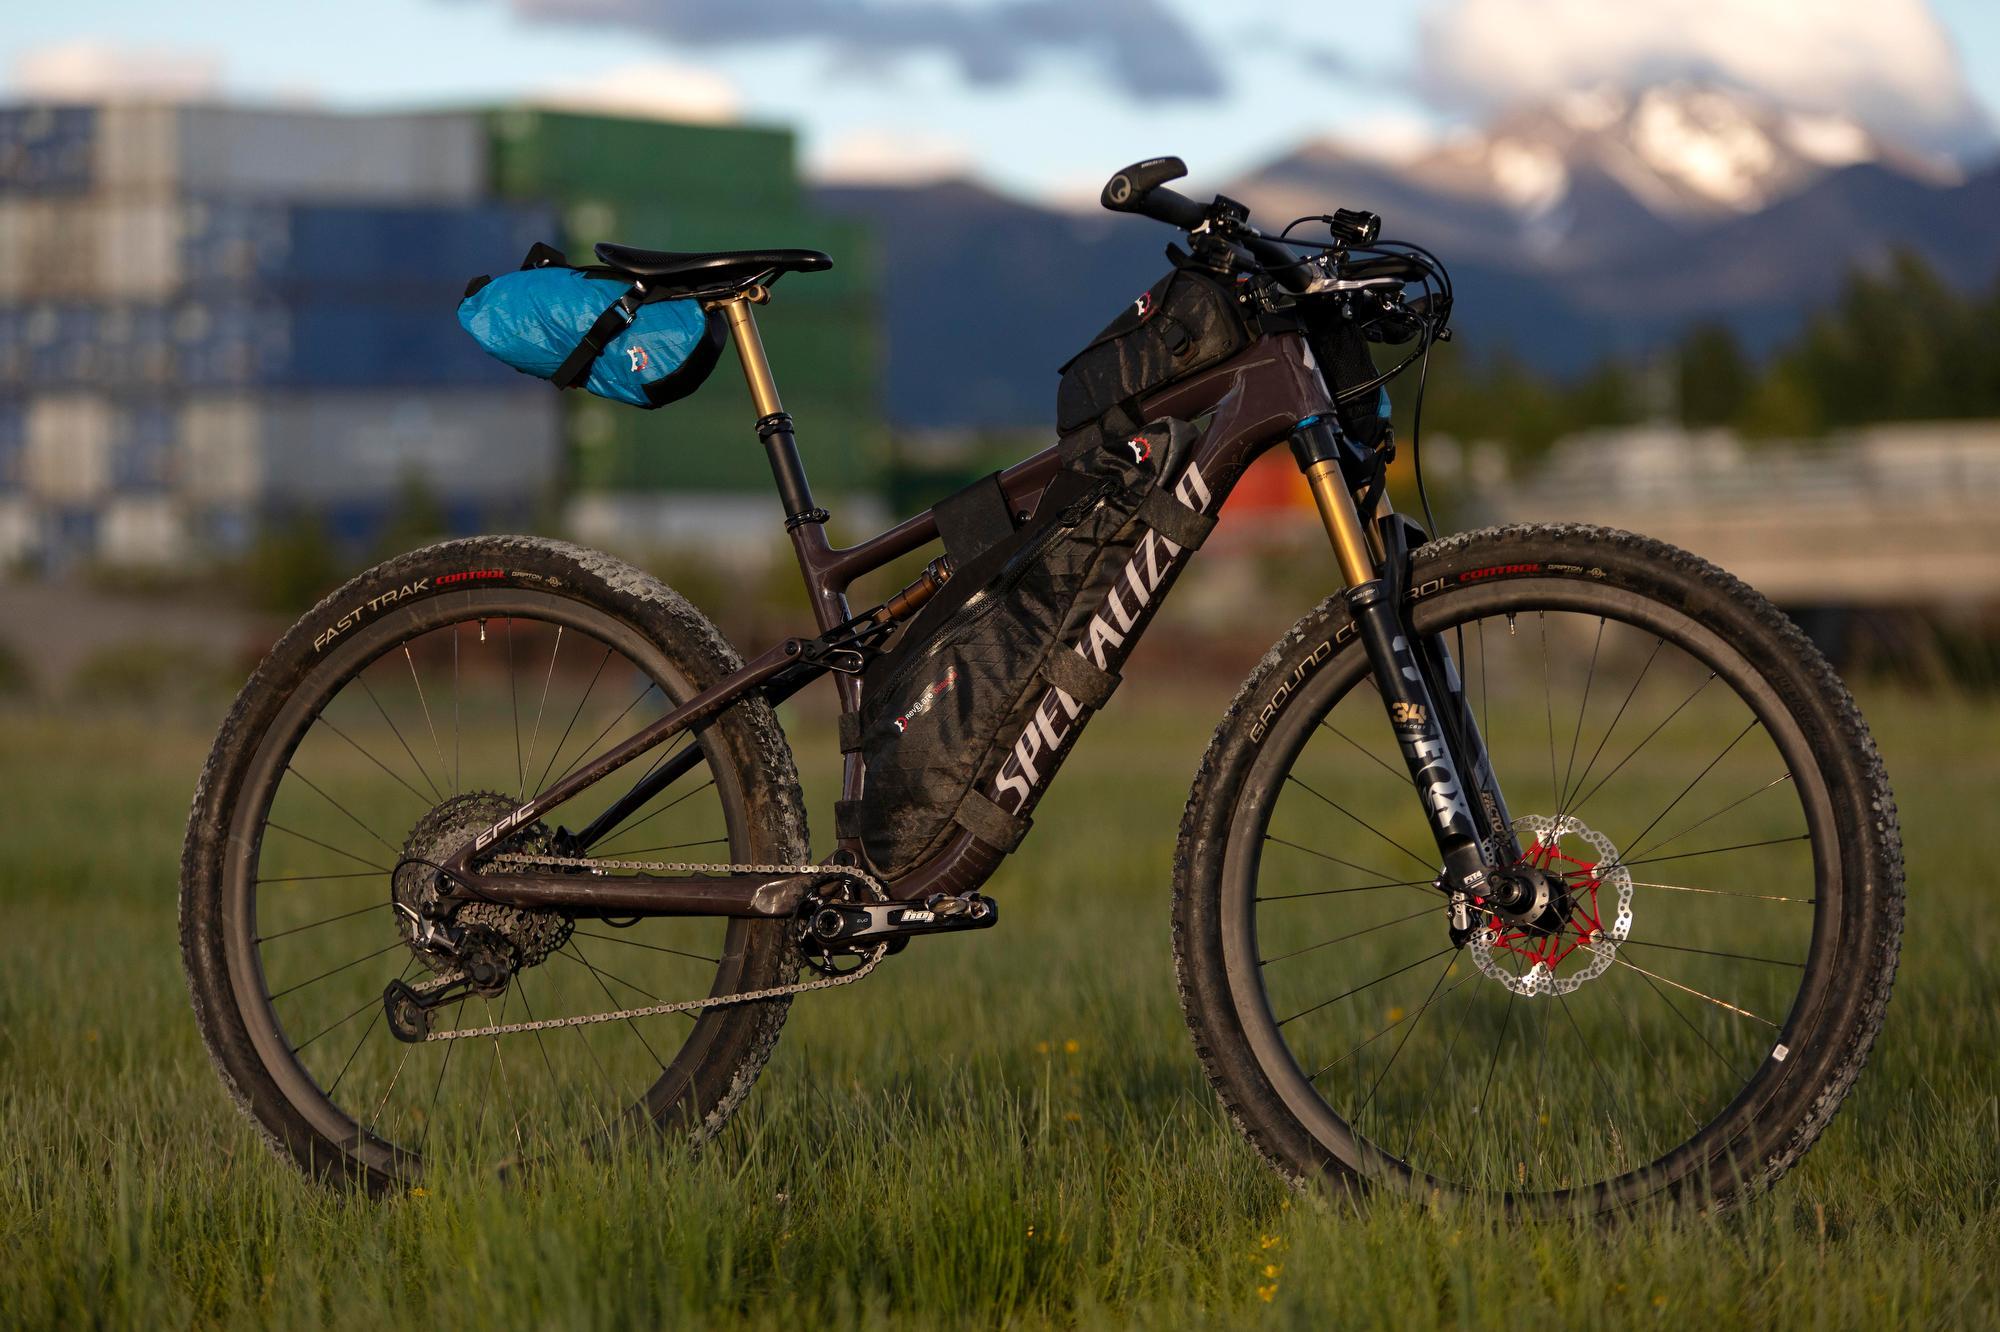 Lael Wilcox Kenai 250 Bike & Gear 021